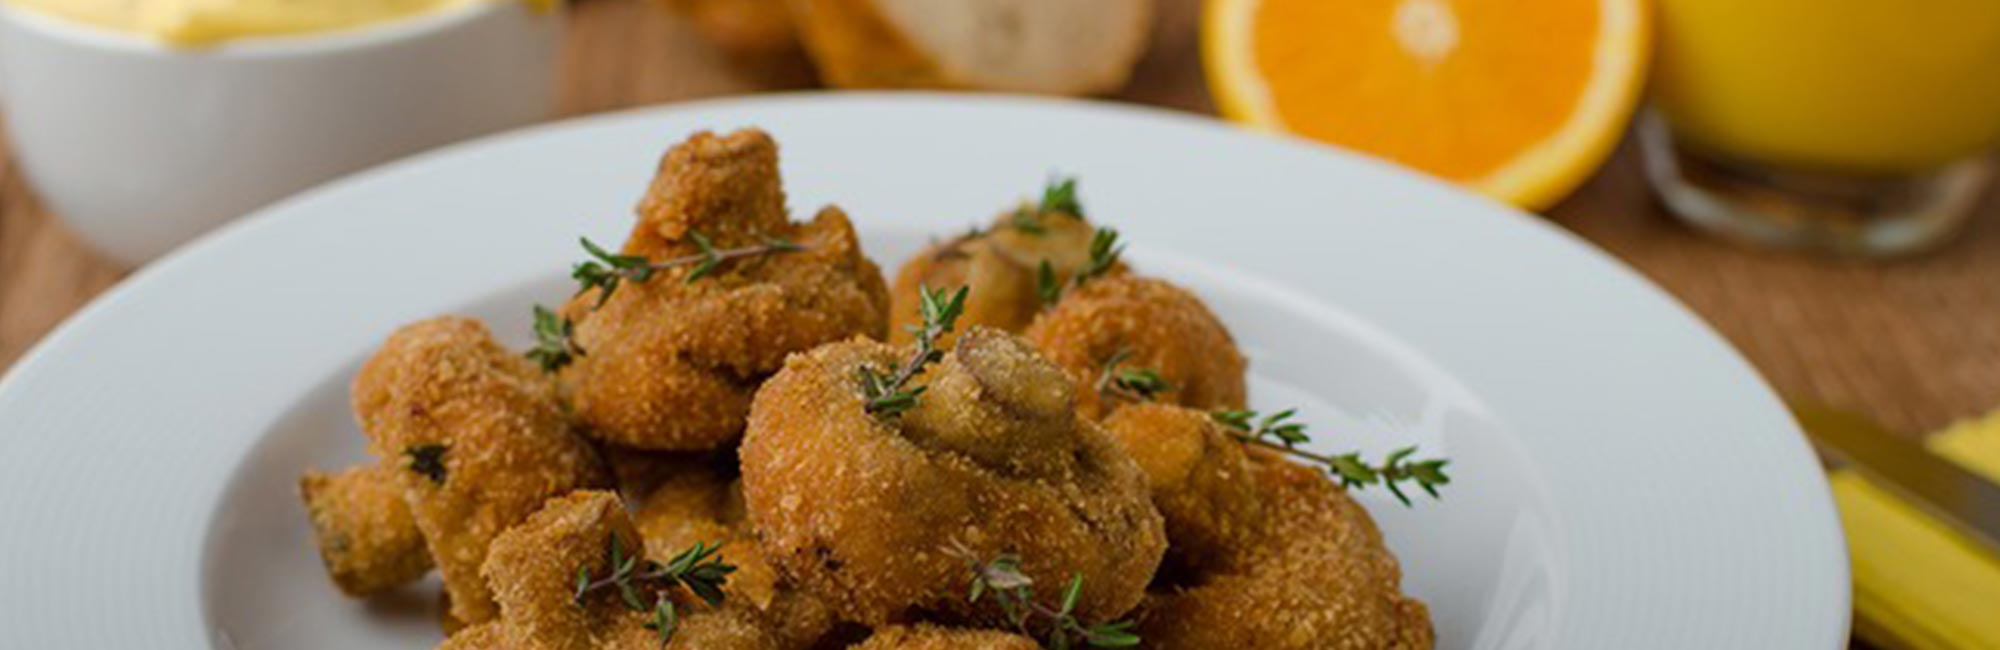 Avocado Oil and Garlic Mushrooms Recipe